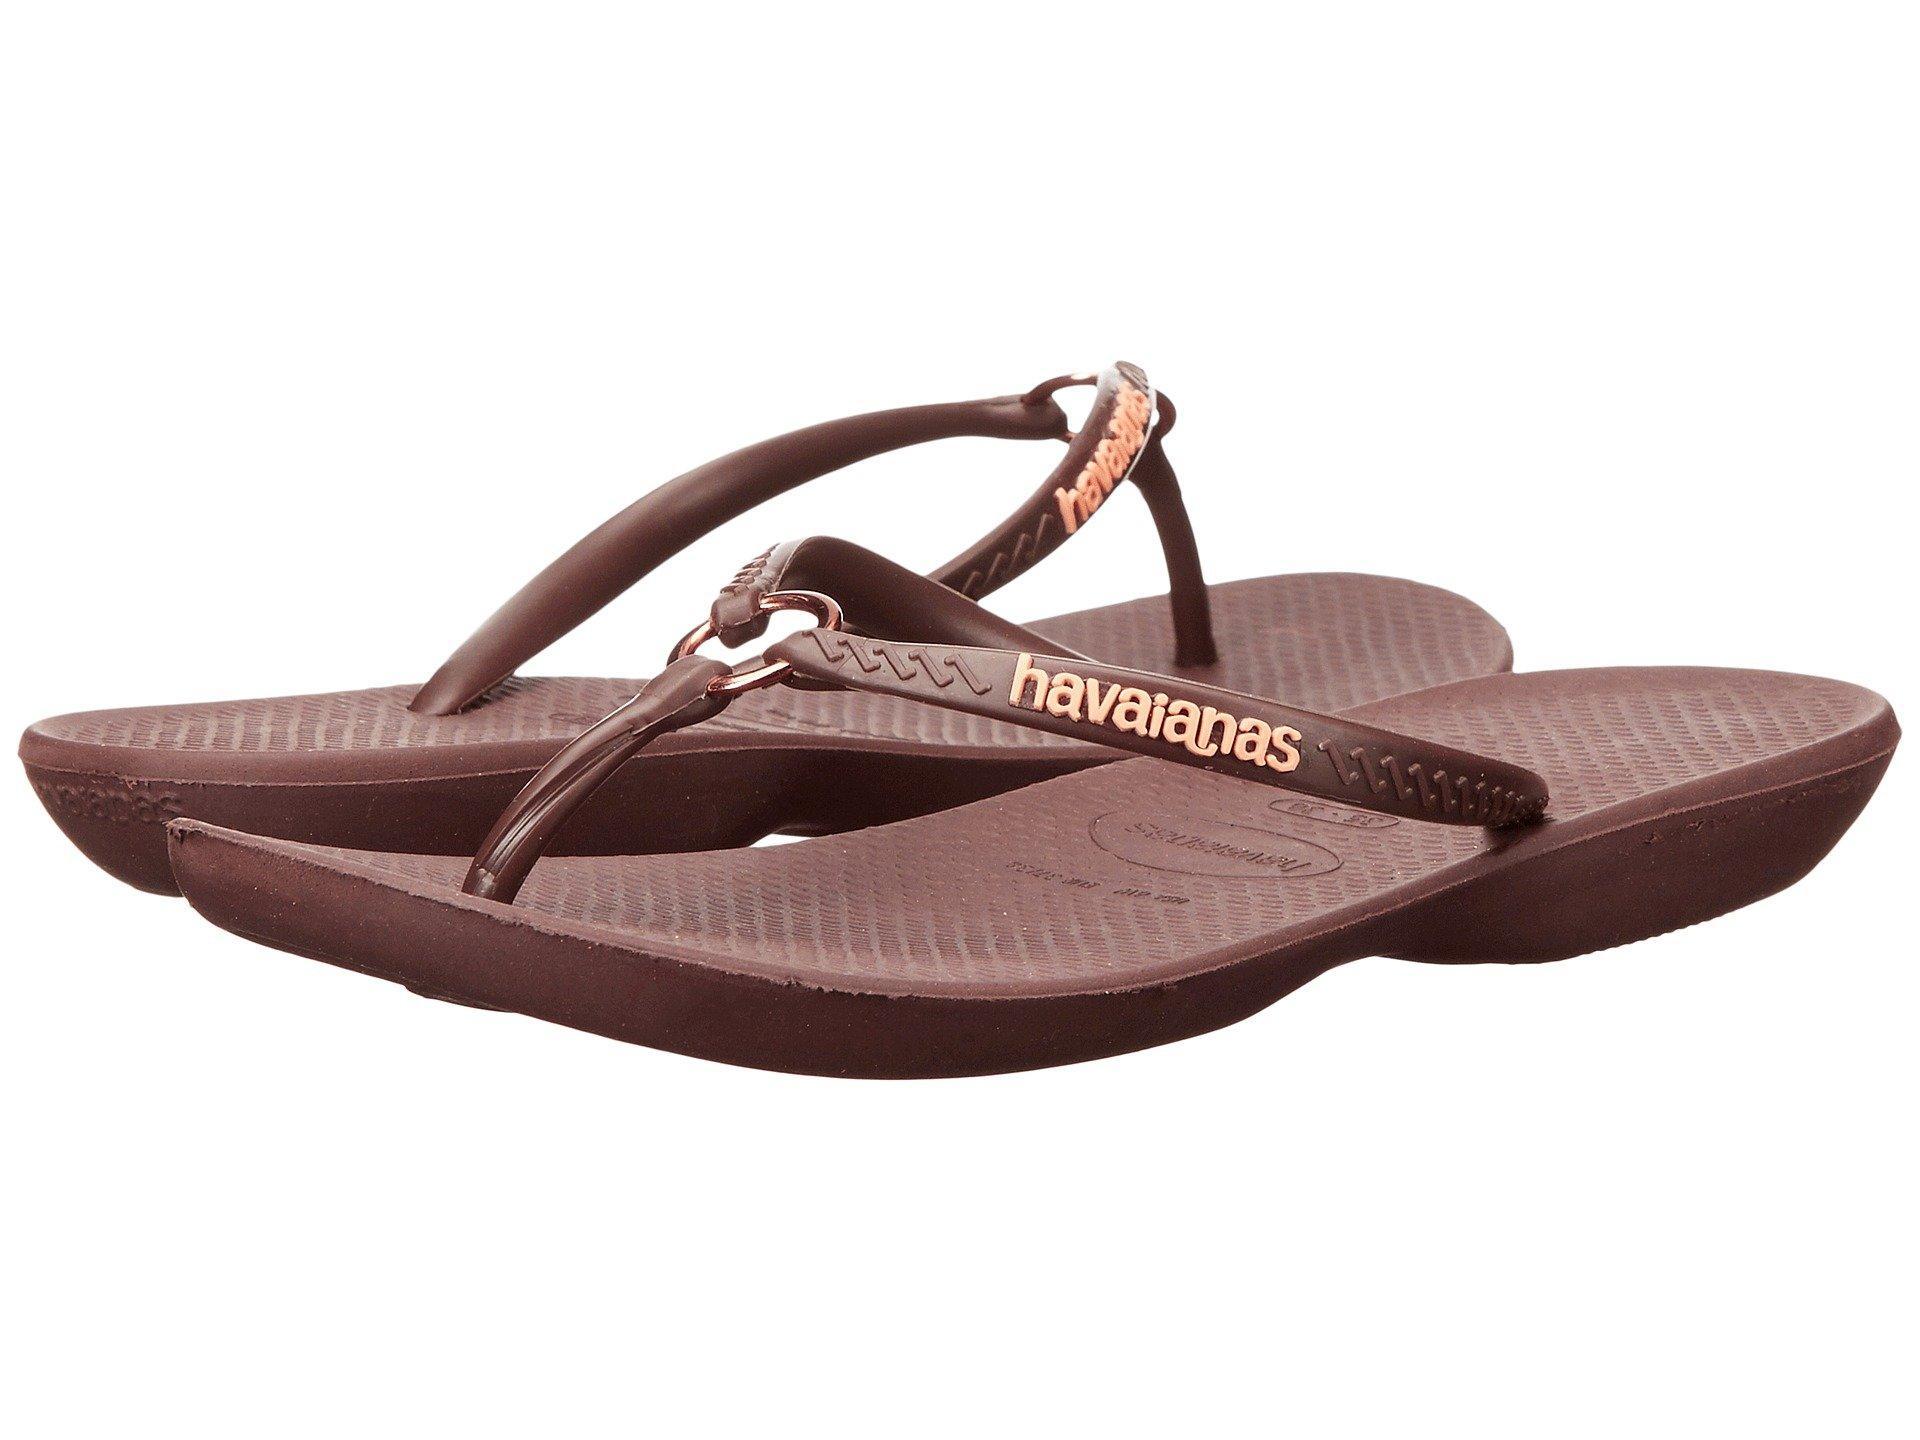 82a90a5082e9 Havaianas Ring Flip Flops In Dark Brown Dark Brown